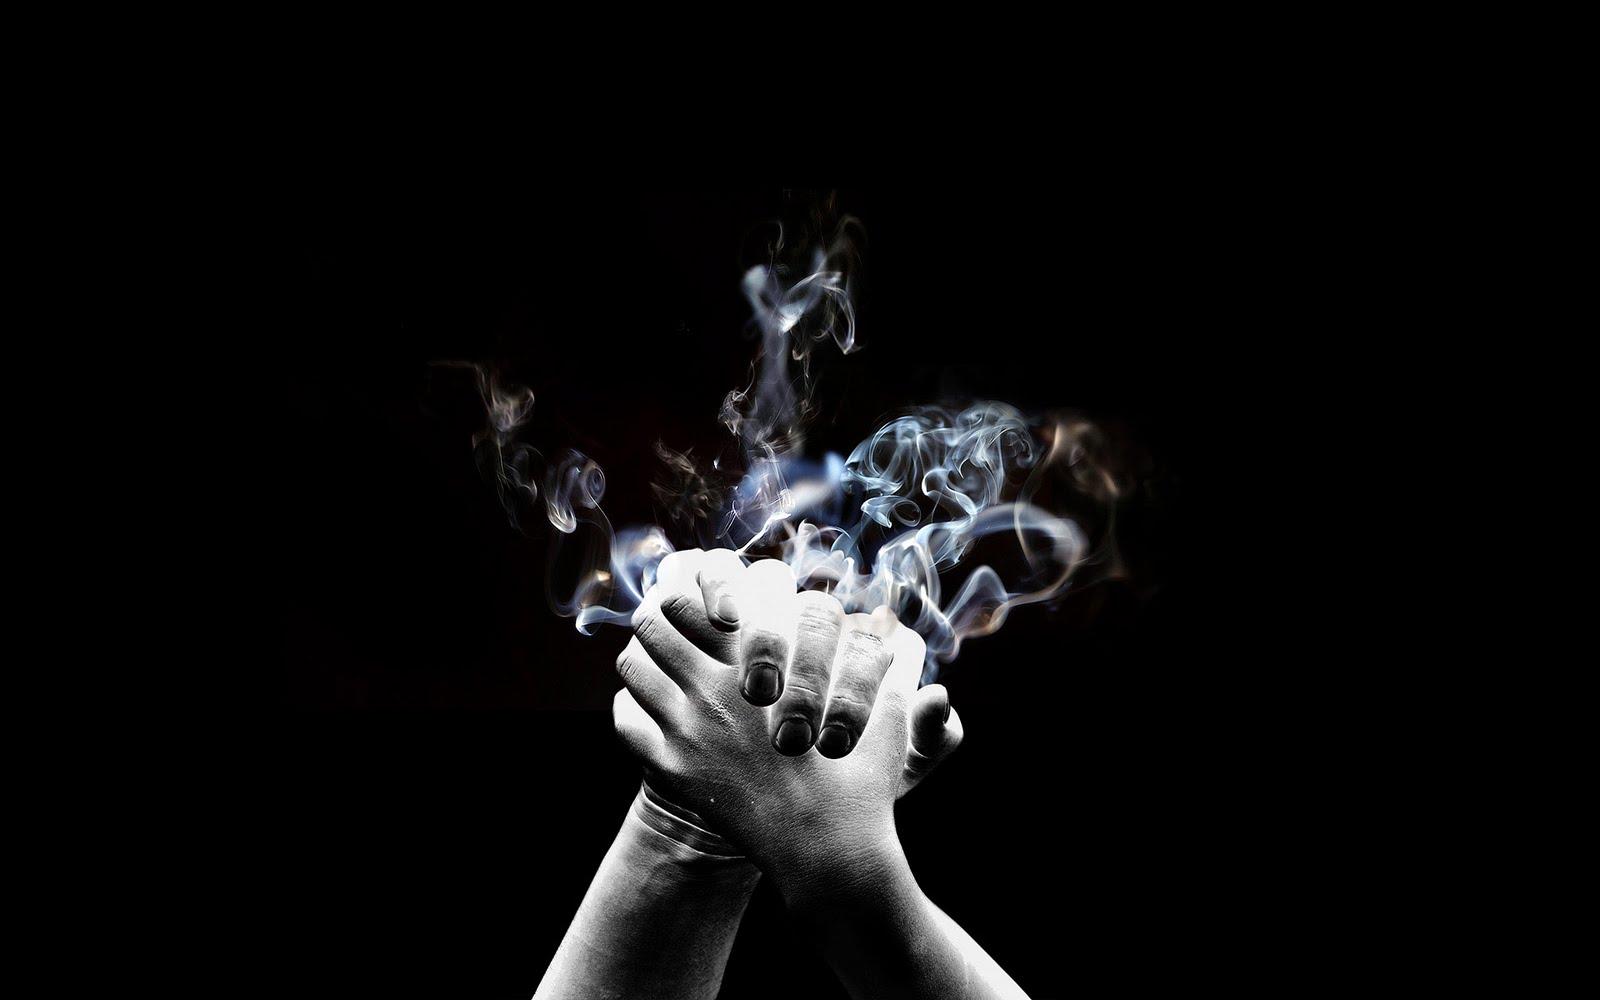 http://1.bp.blogspot.com/-Hb5kveXt7mU/Tl-D74ueF2I/AAAAAAAADzE/c5wEcdVD7Oc/s1600/Black+smoke+wallpaper+3.jpg